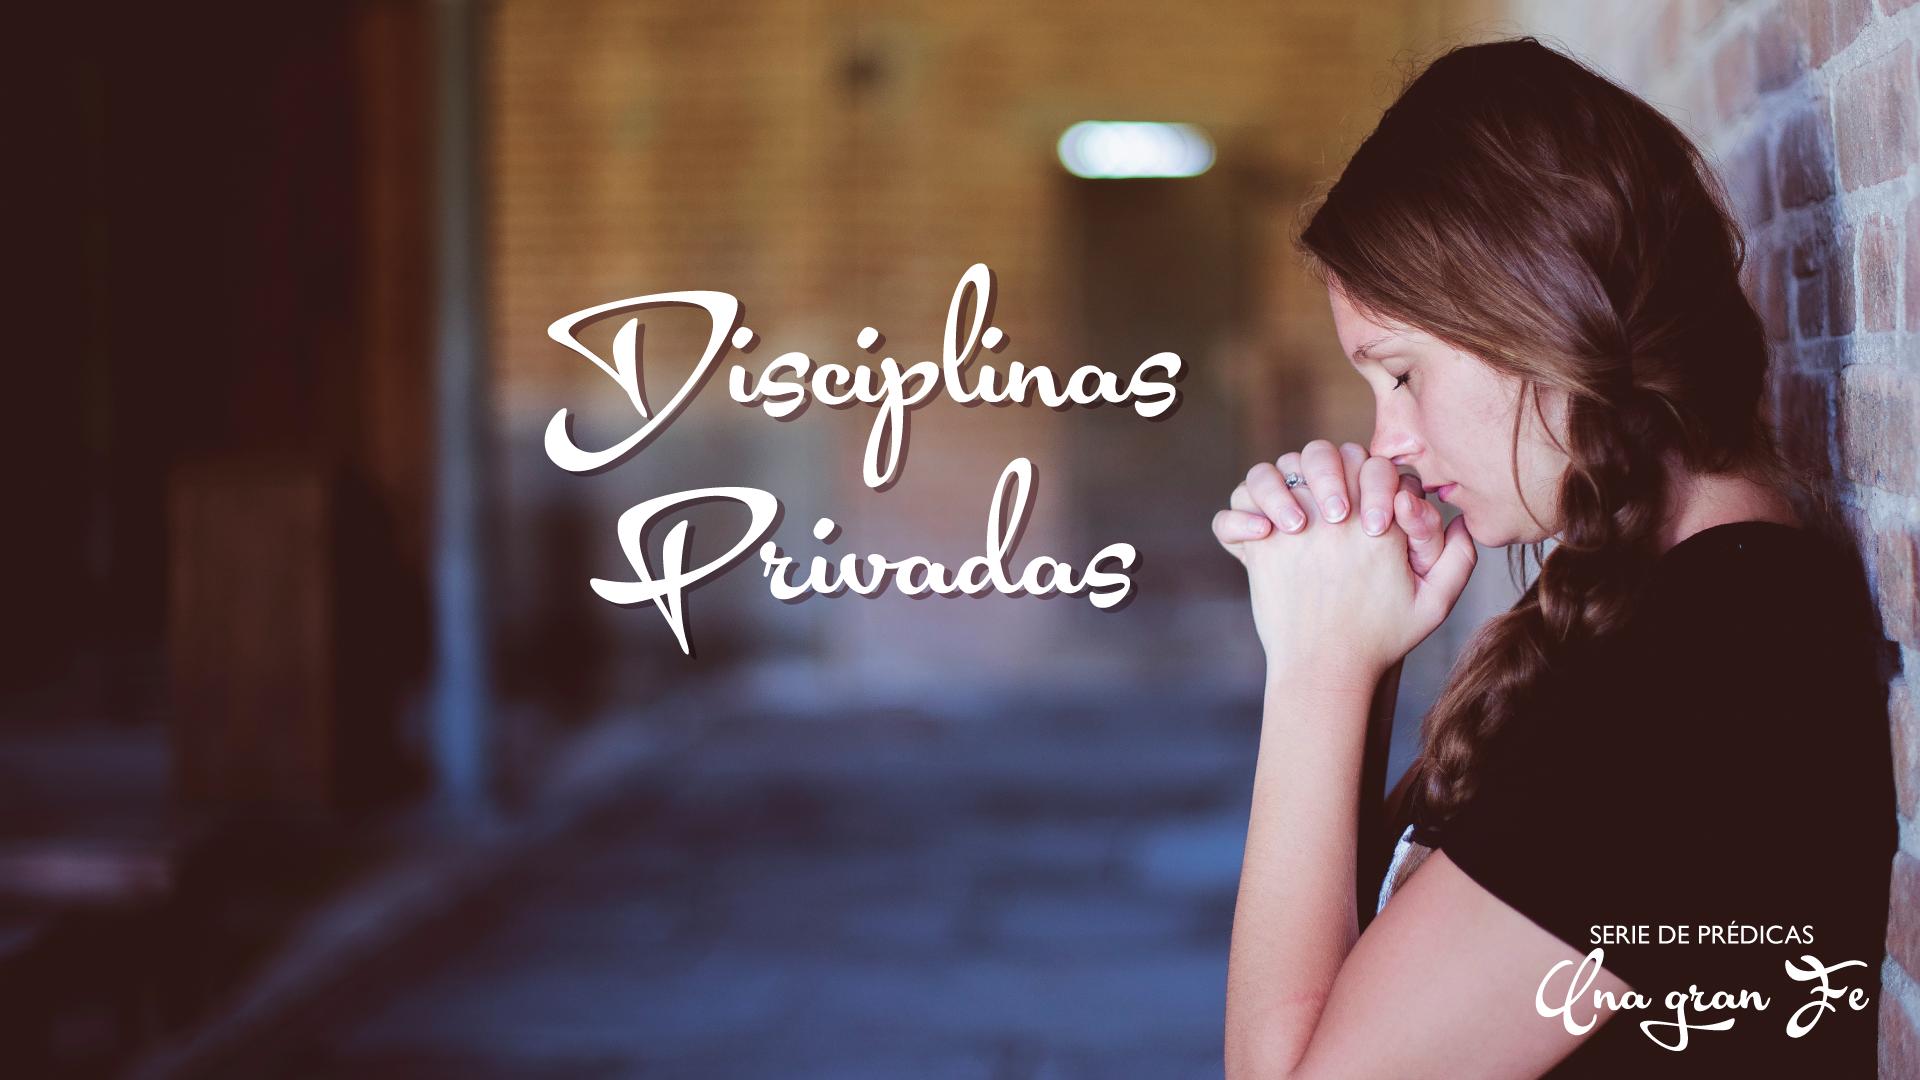 Disciplinas Privadas